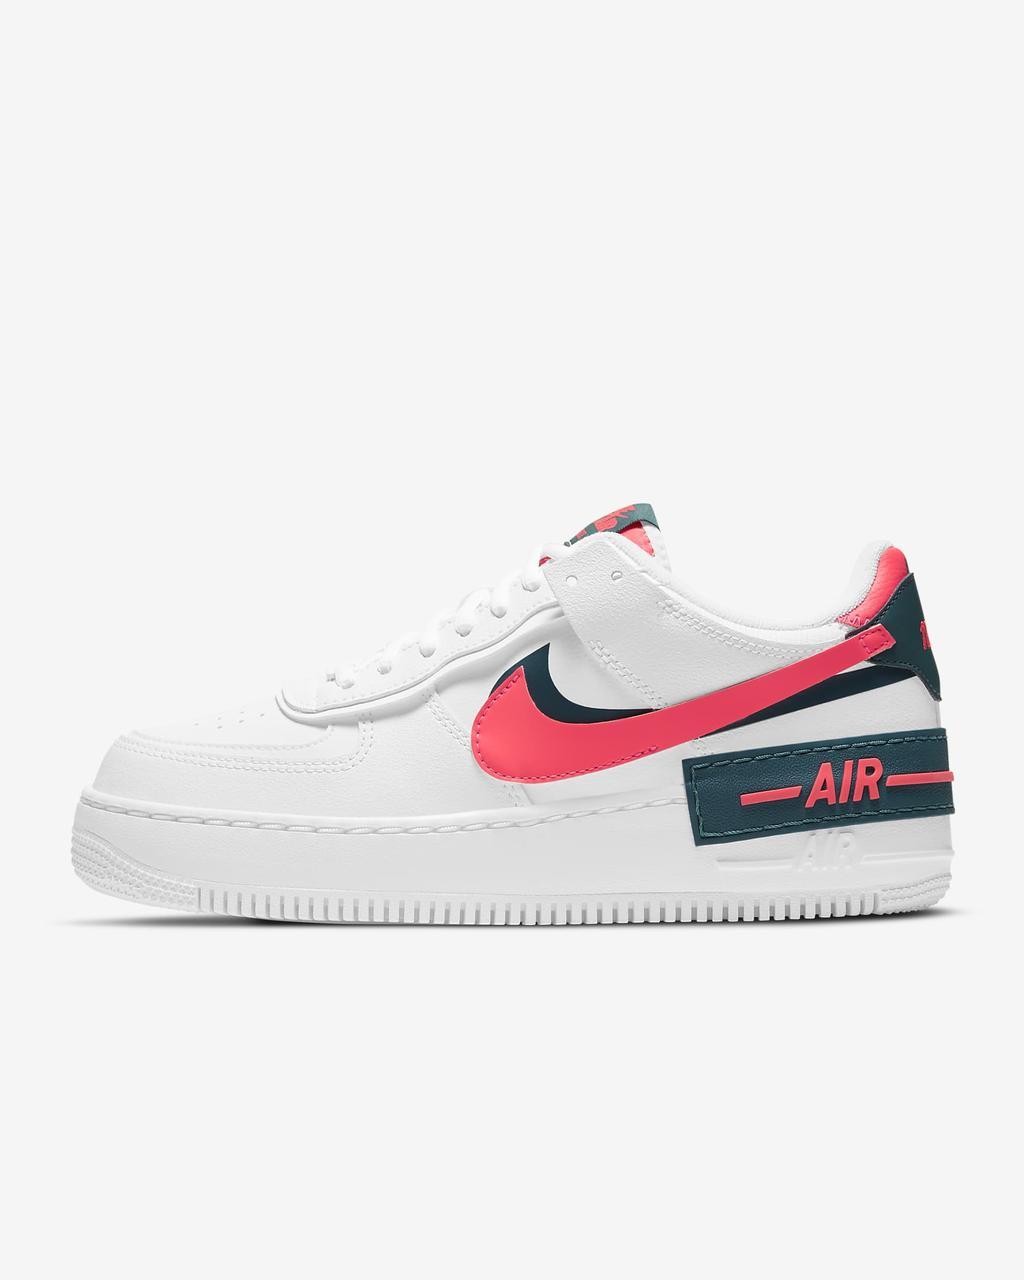 Кроссовки Nike Air Force 1 Shadow DB3902-100 36(22.5см) 5.5(US)